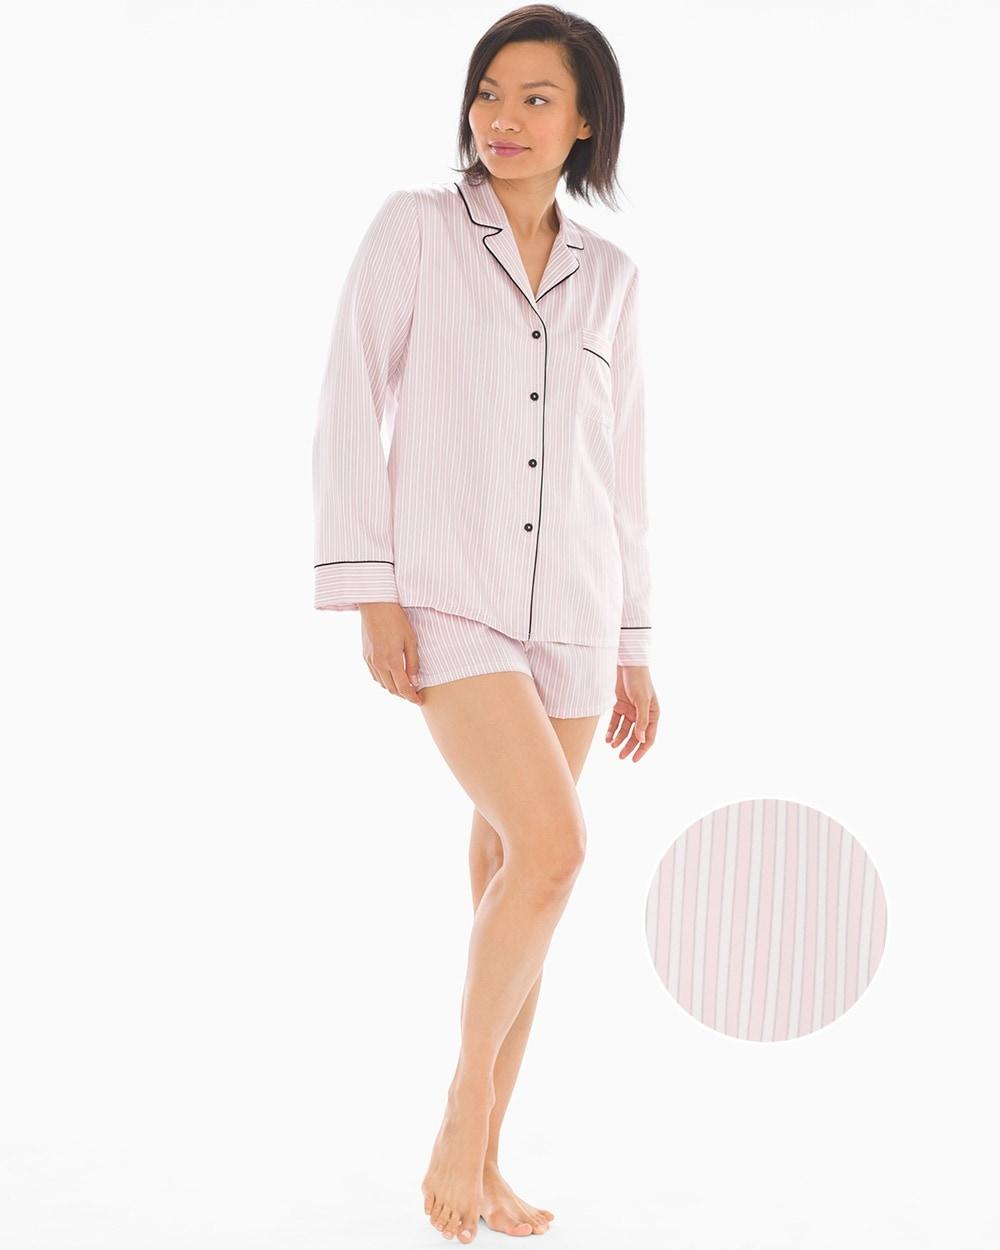 19a4d4eaa Look of Love Satin Shorts Stripe Pajama Set - Soma